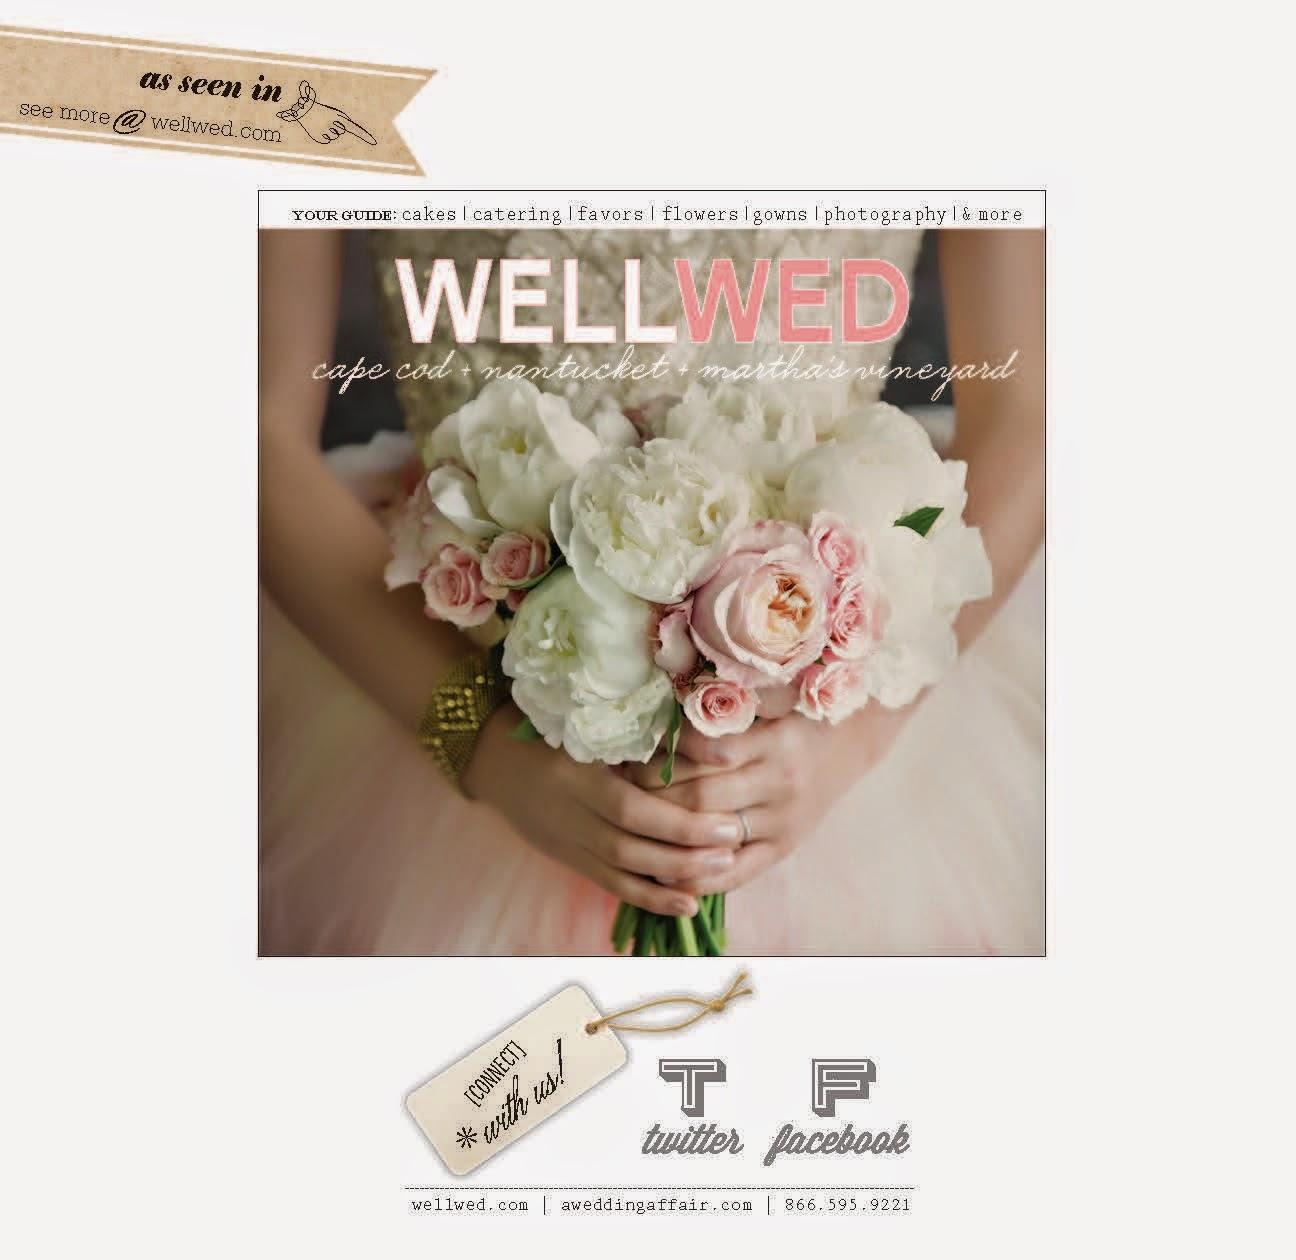 WellWed New York - WellWed CapeCod, Nantucket, Martha's Vineyard - Tartan & Tulle - Splendid Stems Floral Designs